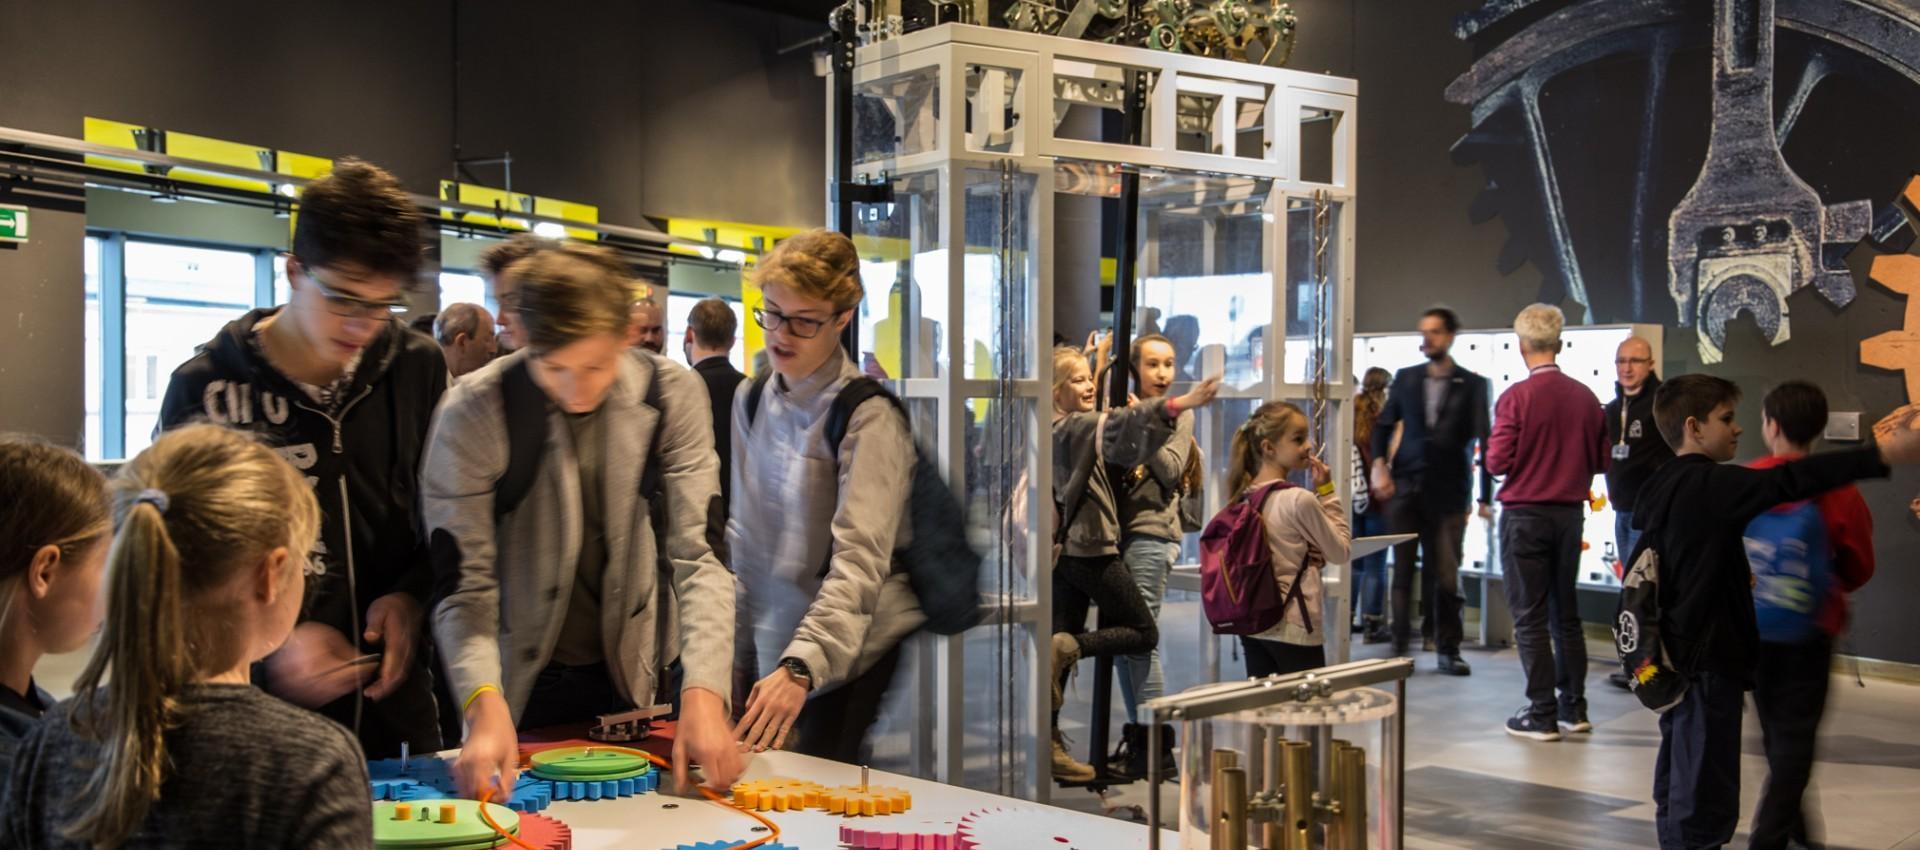 Nowe atrakcje Centrum Nauki i Techniki EC1